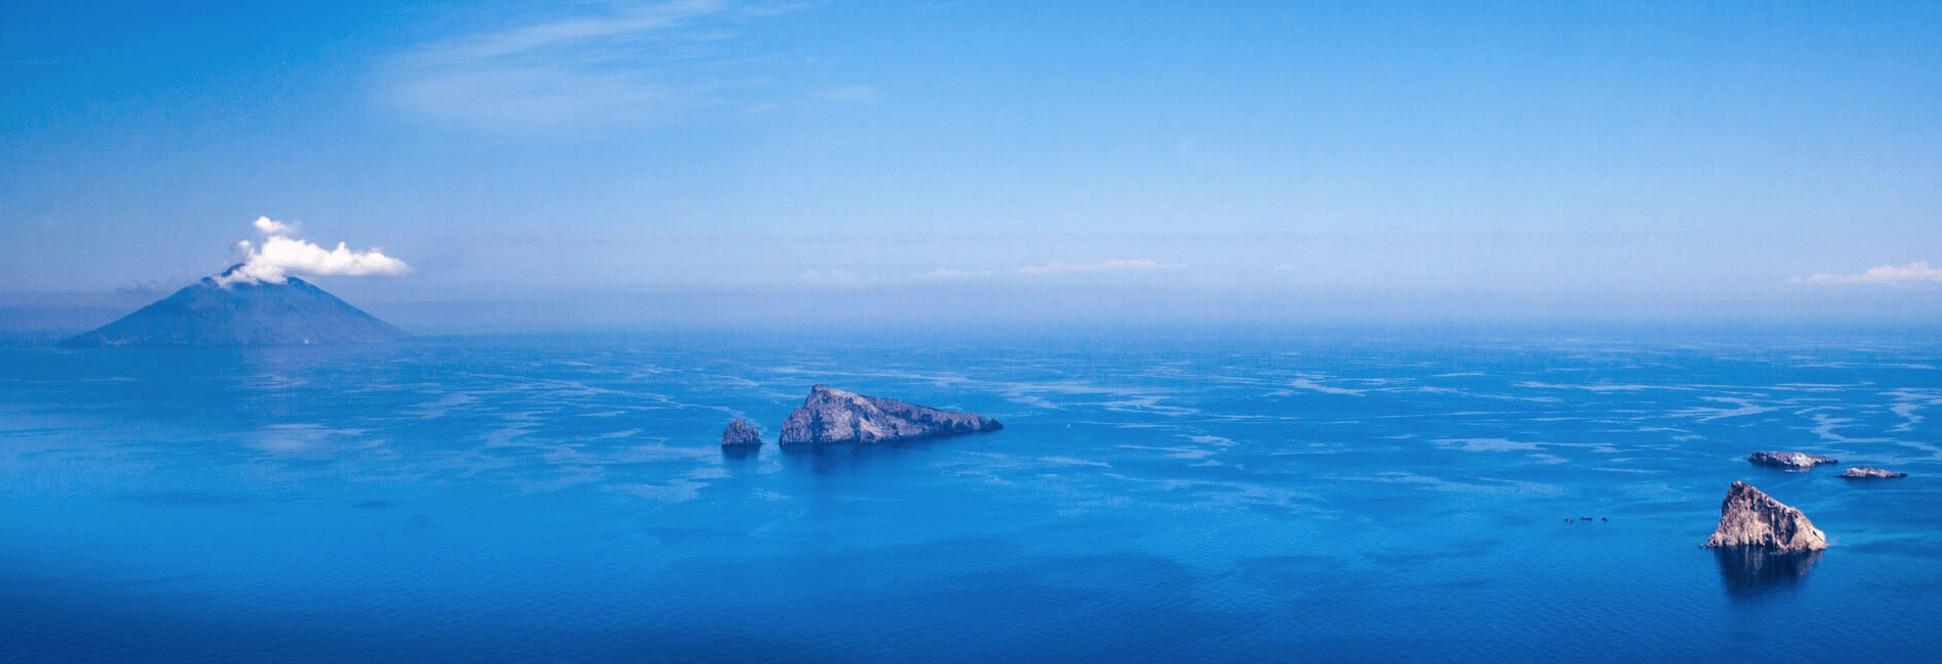 stromboli-yacht-charter-stromboli-yacht-rental-stromboli-boat-charter-stromboli-boat-rental-stromboli-sailing-charter-aeolian-islands